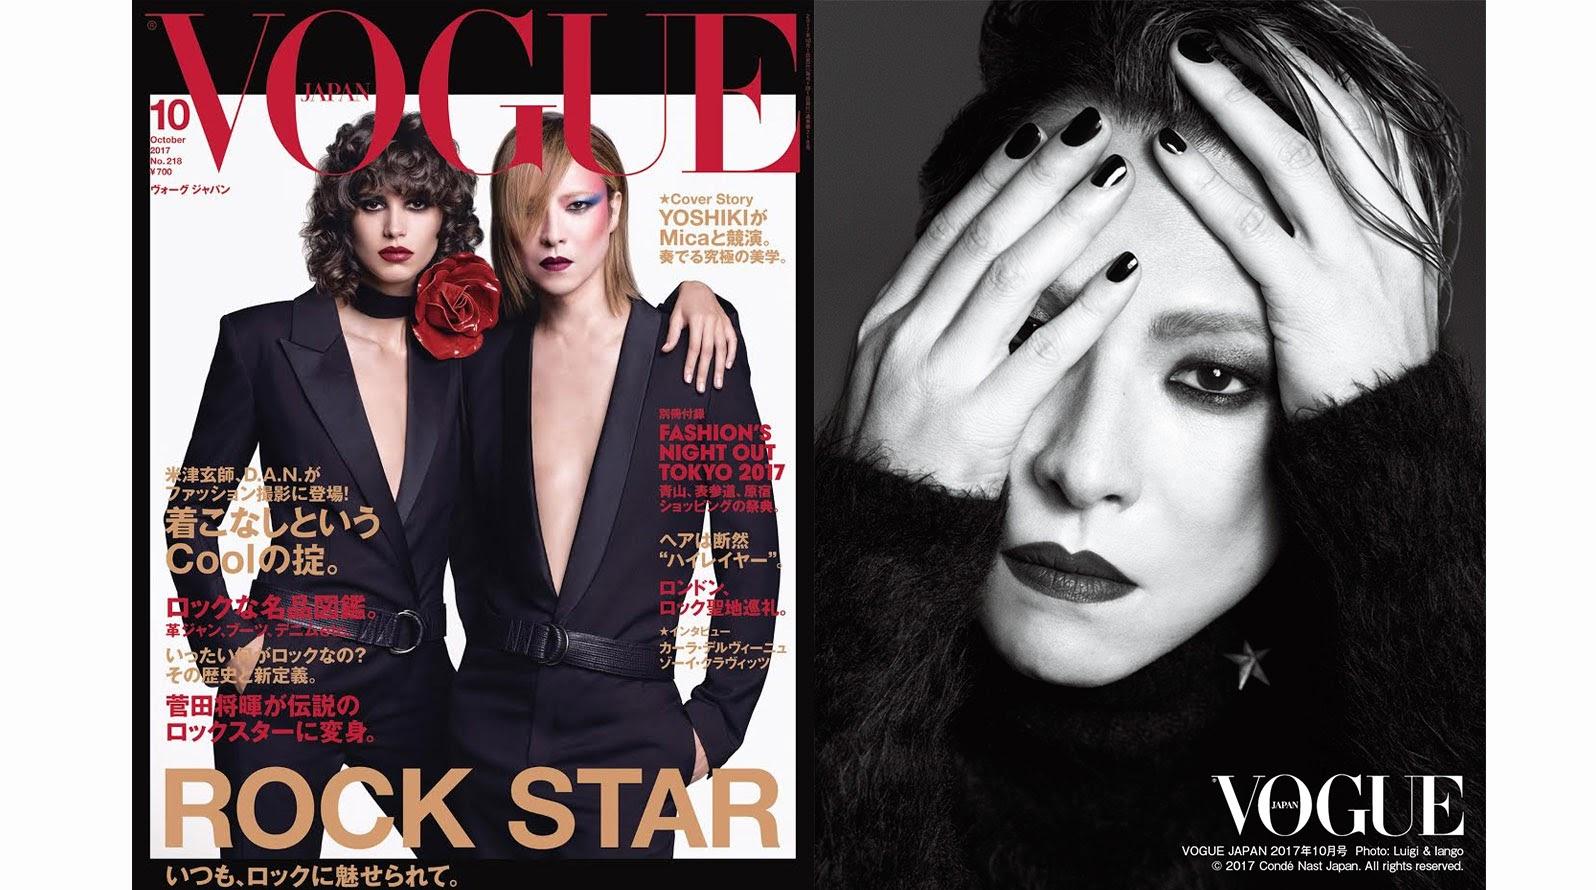 YOSHIKI成為第一位登上Vogue Japan封面的日本男性